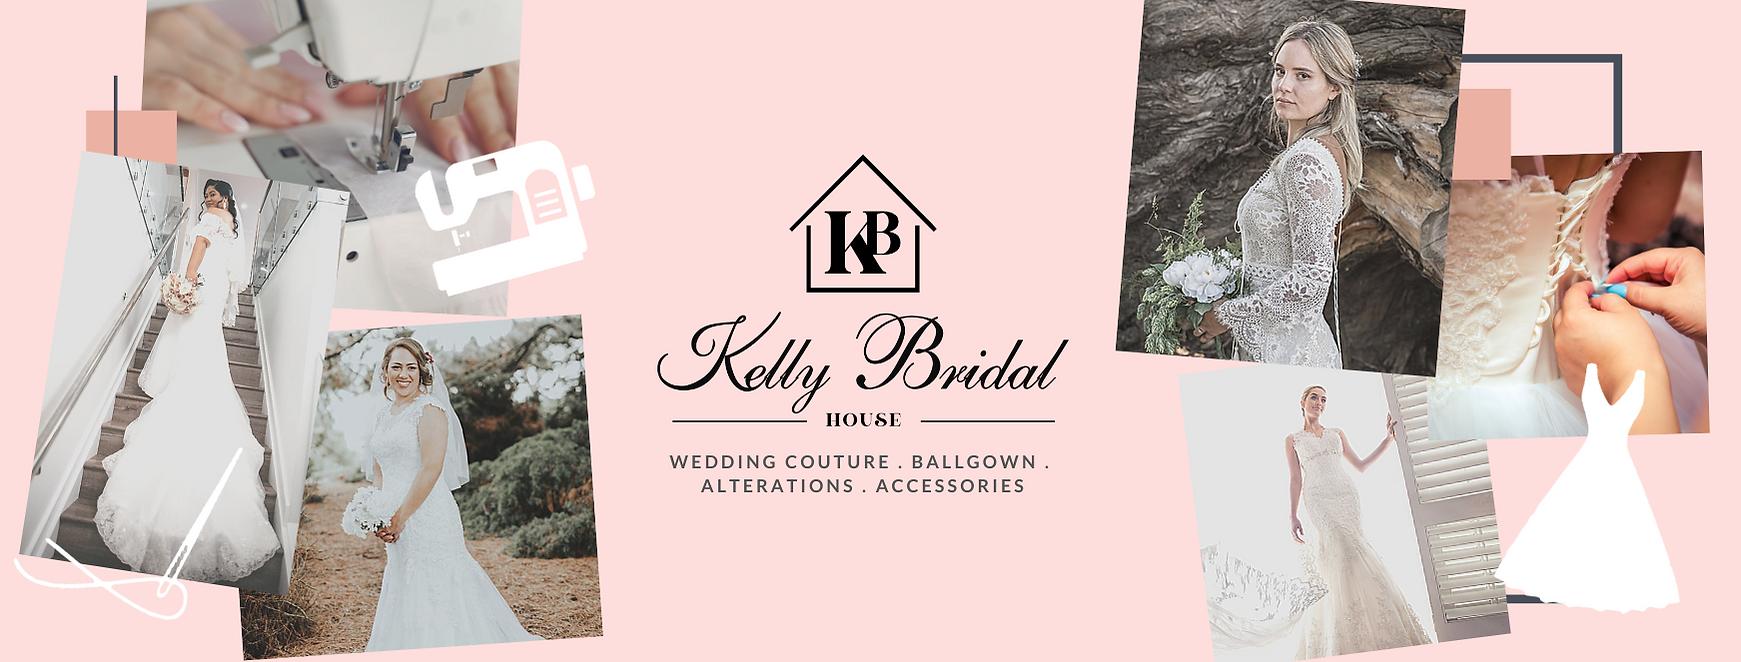 KBH Homepage Banner.png